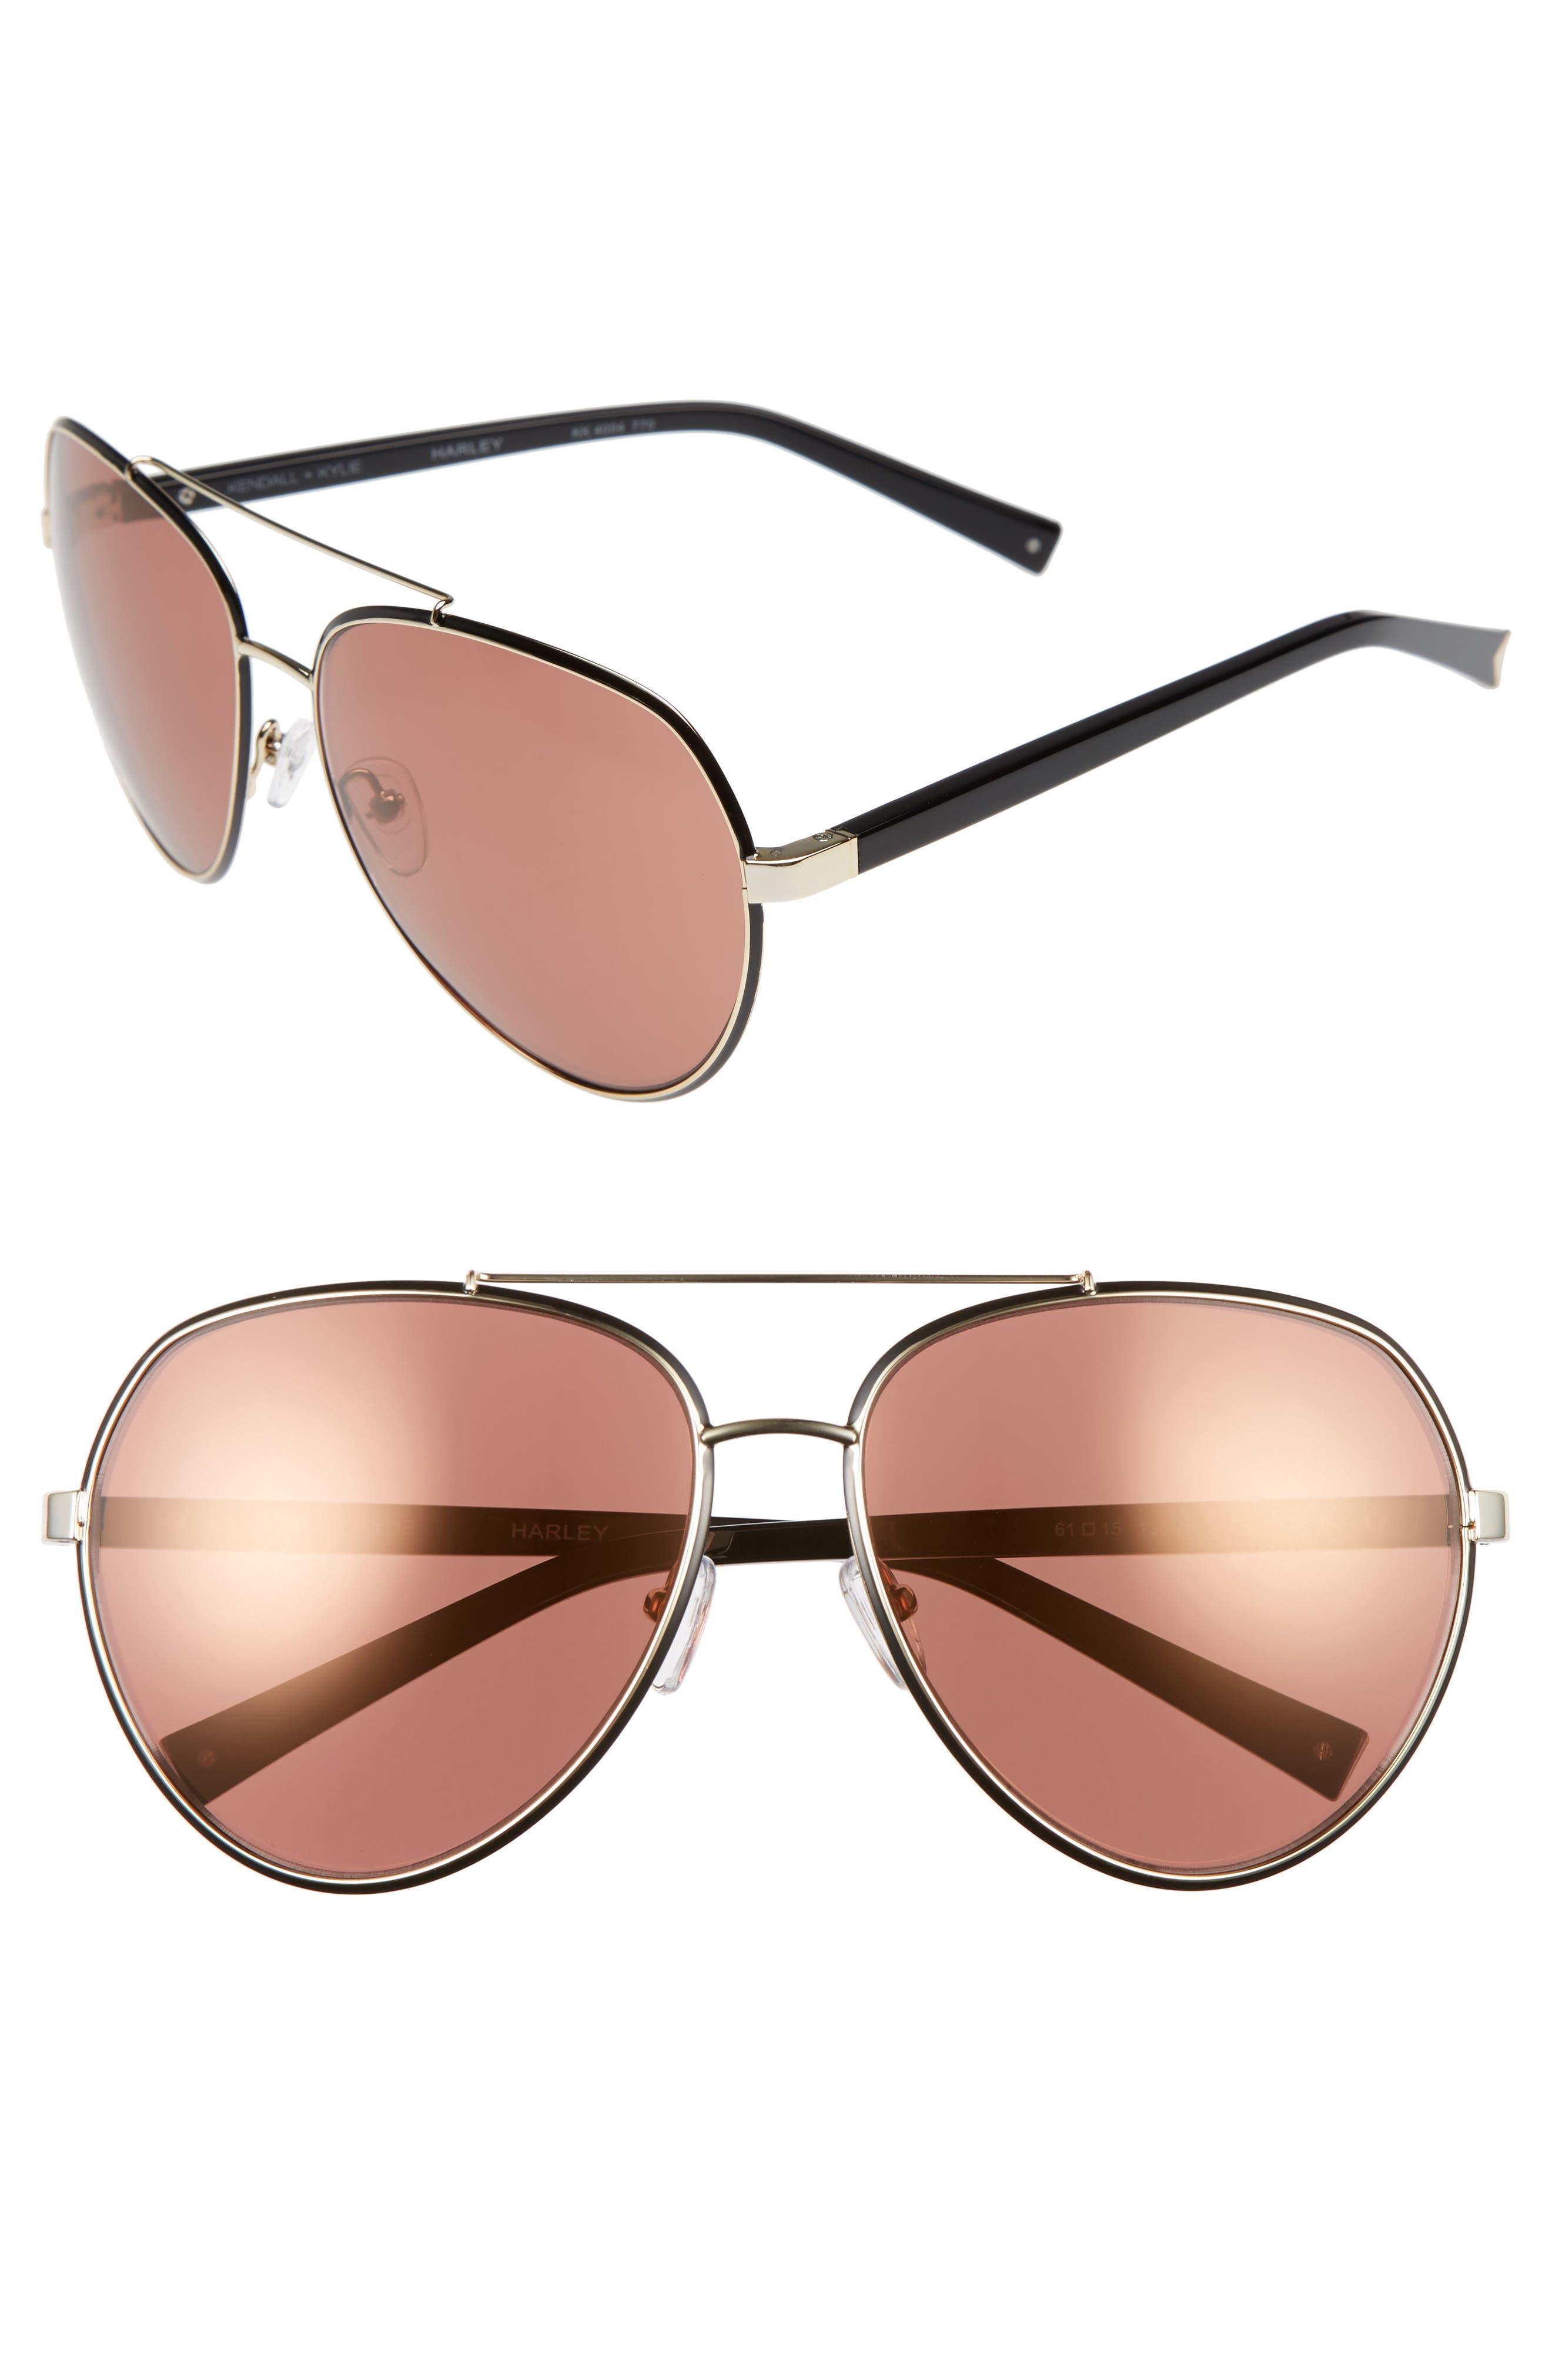 61mm Aviator Sunglasses,                         Main,                         color, Shiny Gold/ Shiny Black